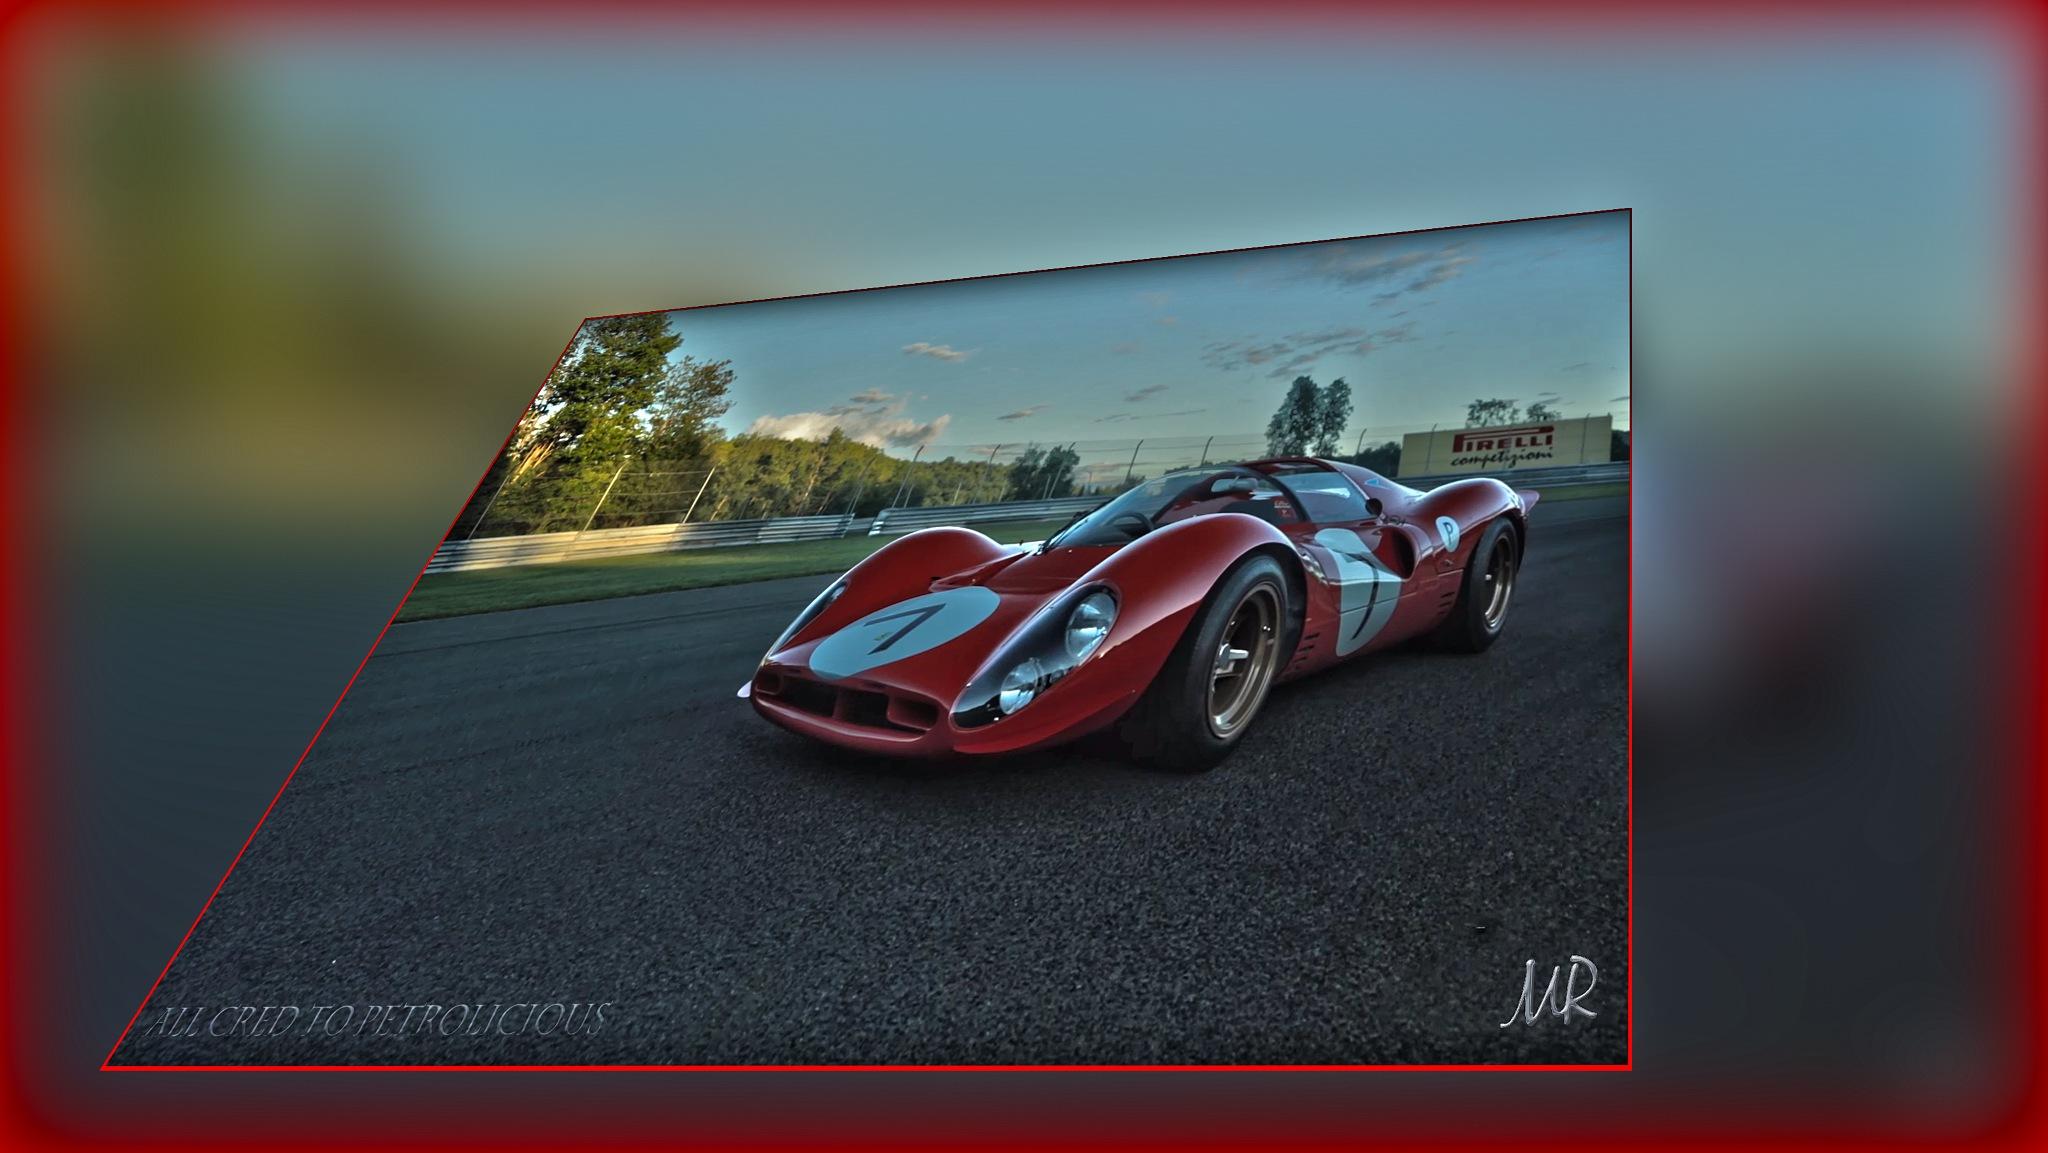 Ferrari 330 P4 by Mikael Rennerhorn